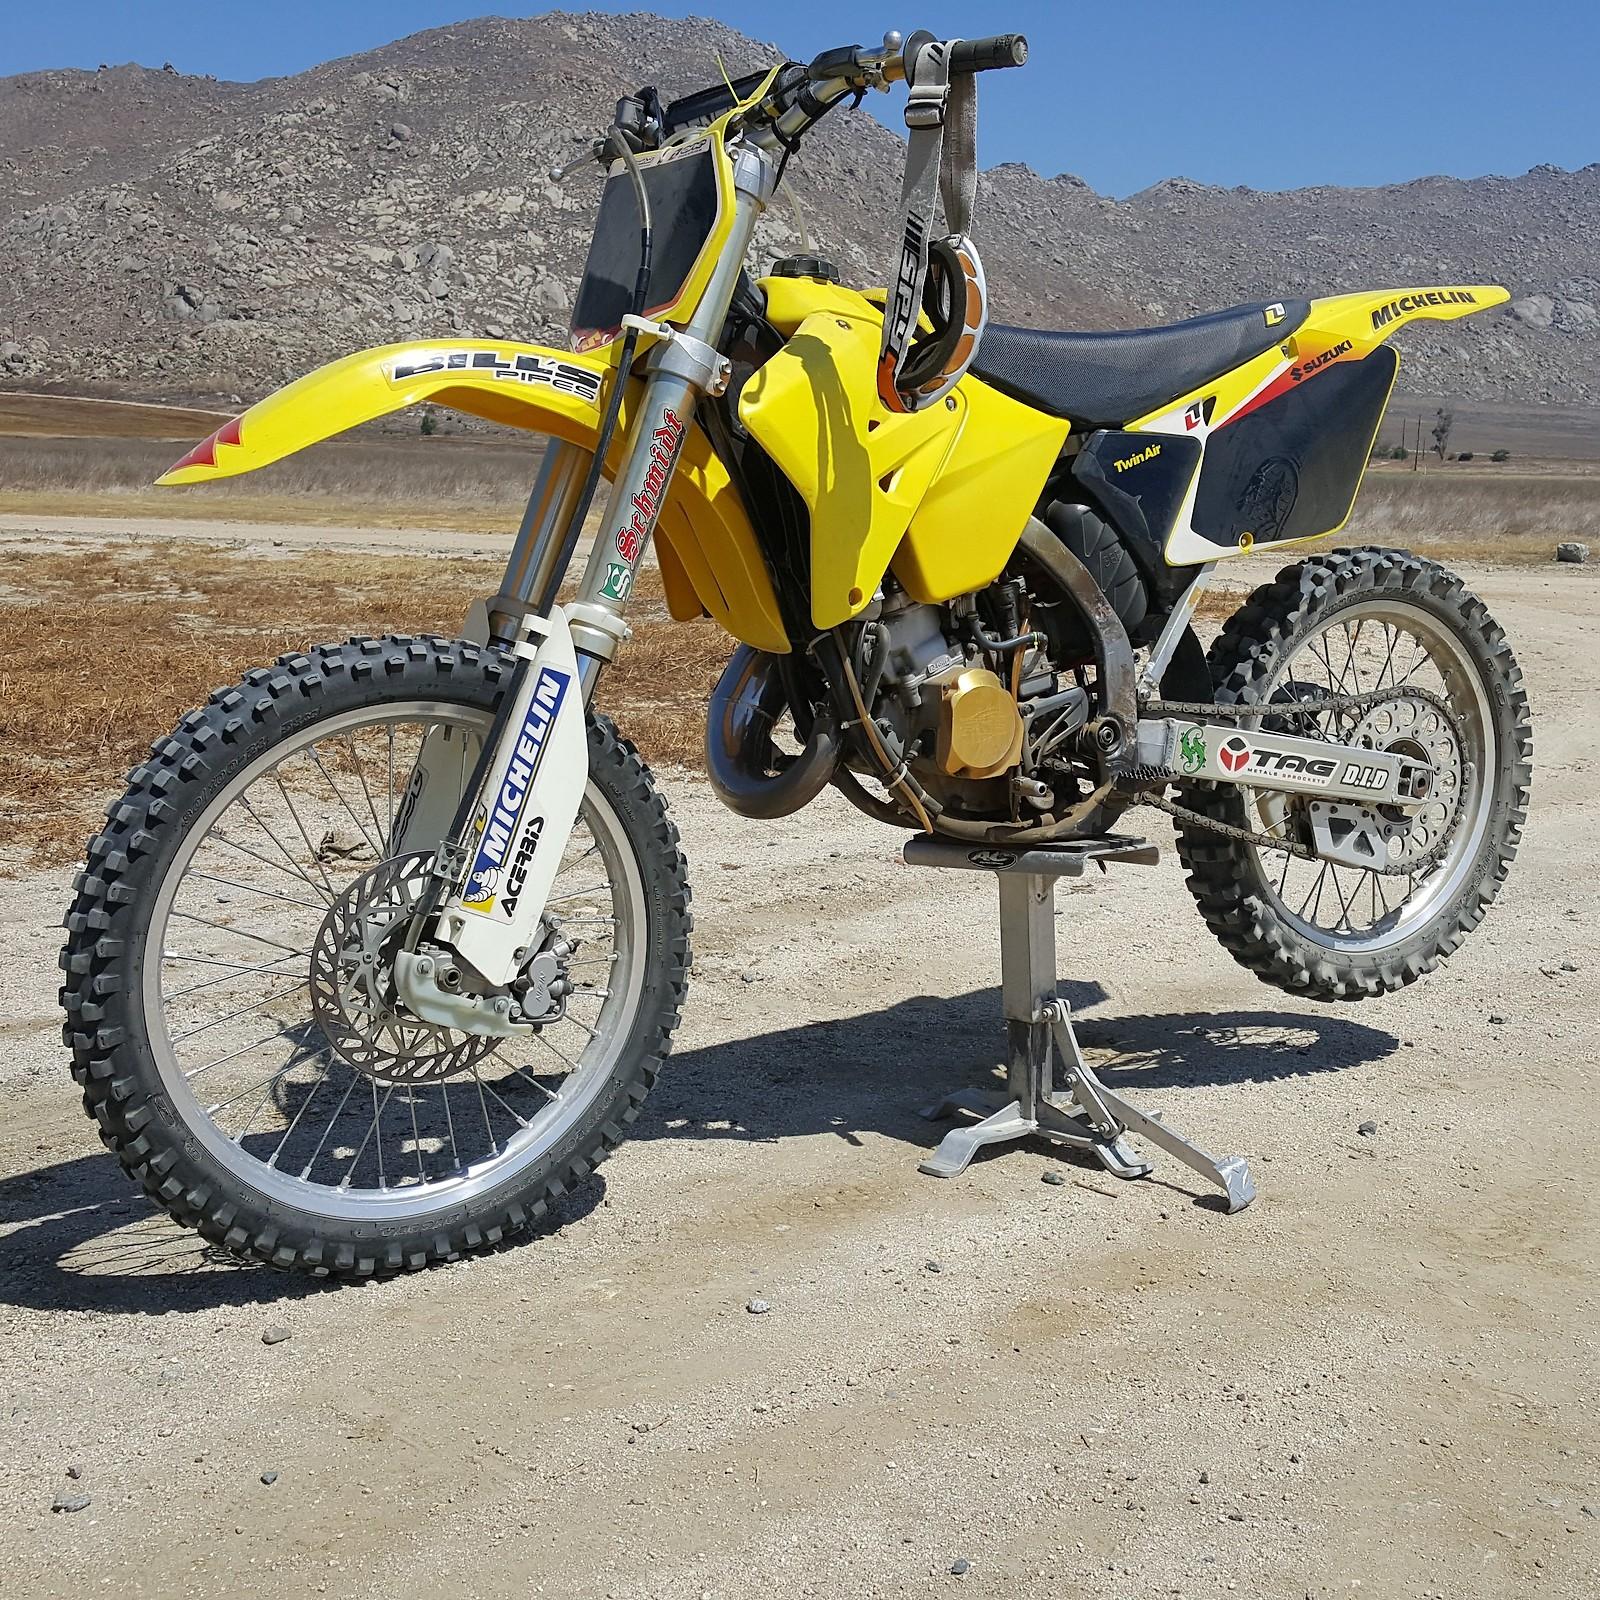 IMG 20180619 183758 162 - JWRM - Motocross Pictures - Vital MX